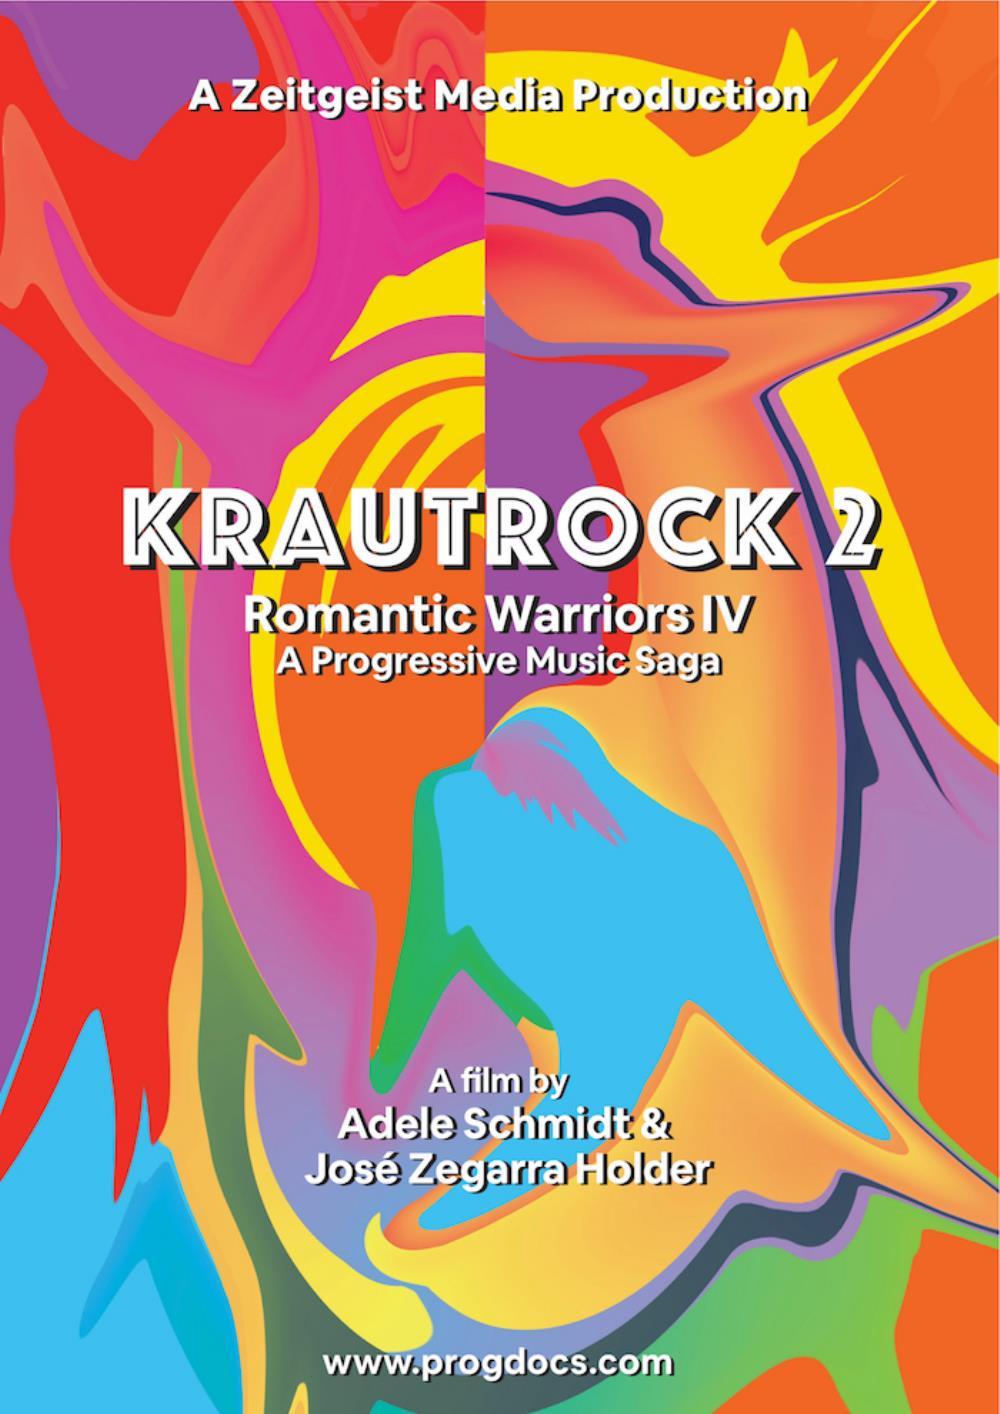 Romantic Warrioirs IV: Krautrock, Part 2 by VARIOUS ARTISTS (CONCEPT ALBUMS & THEMED COMPILATIONS) album cover